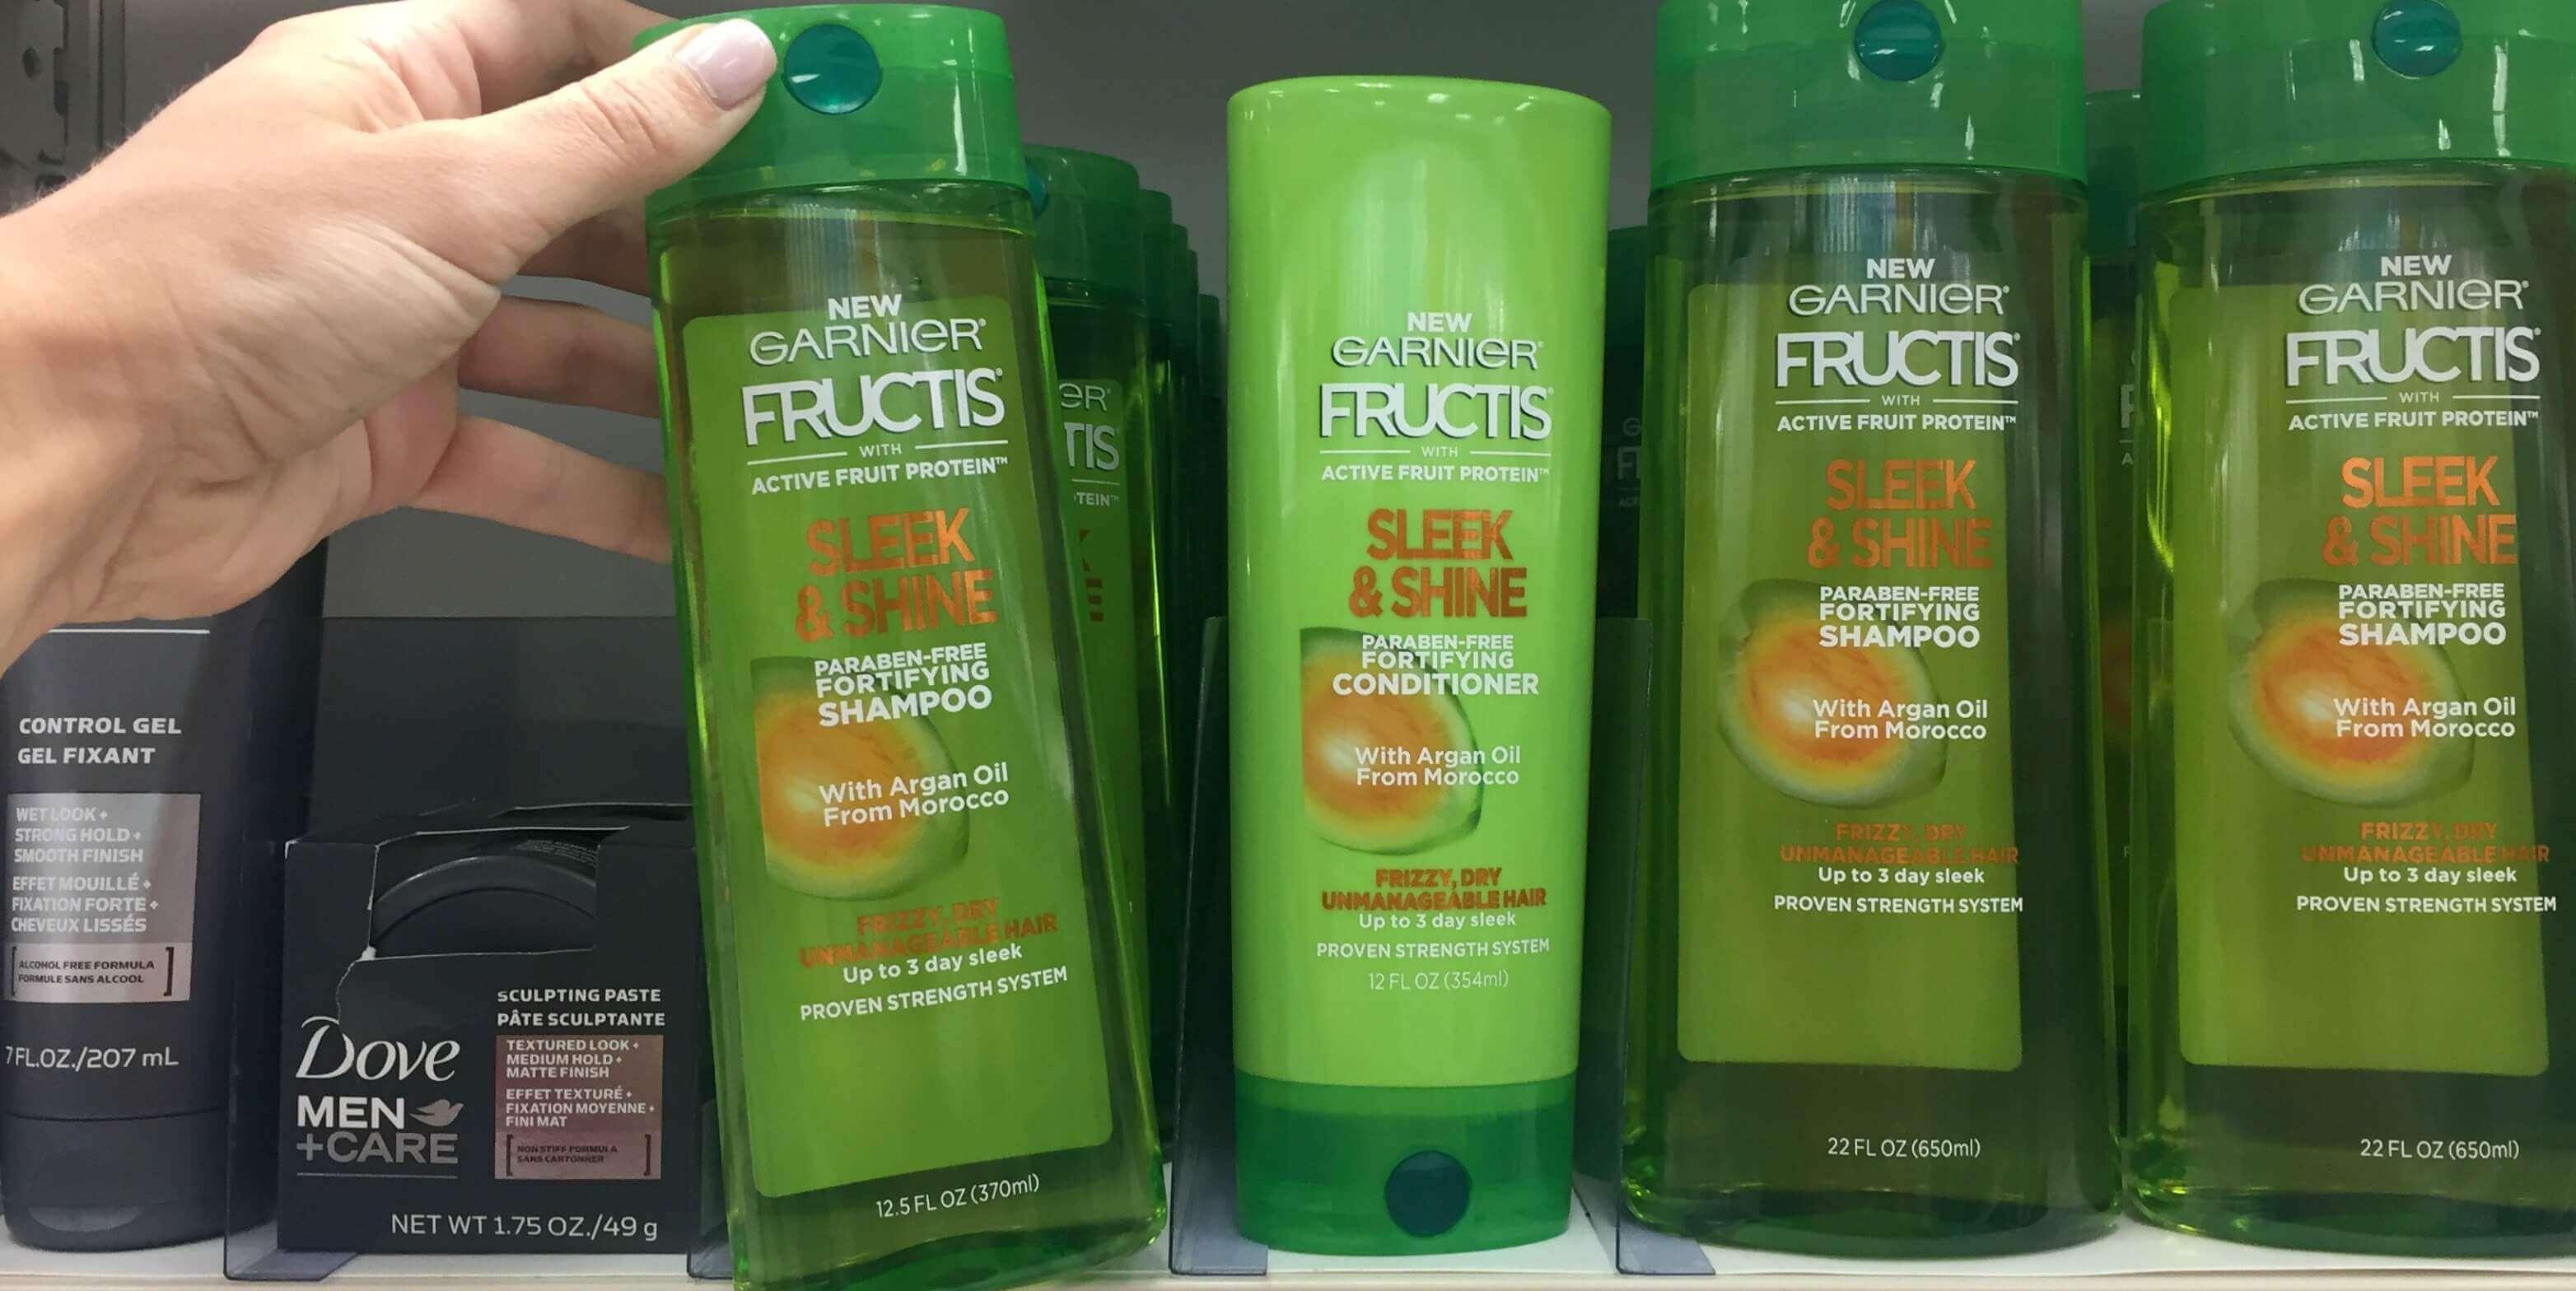 graphic regarding Garnier Fructis Printable Coupon identified as Clean $2/1 Garnier Fructis Hair Treatment Coupon - $3 Economical Producer